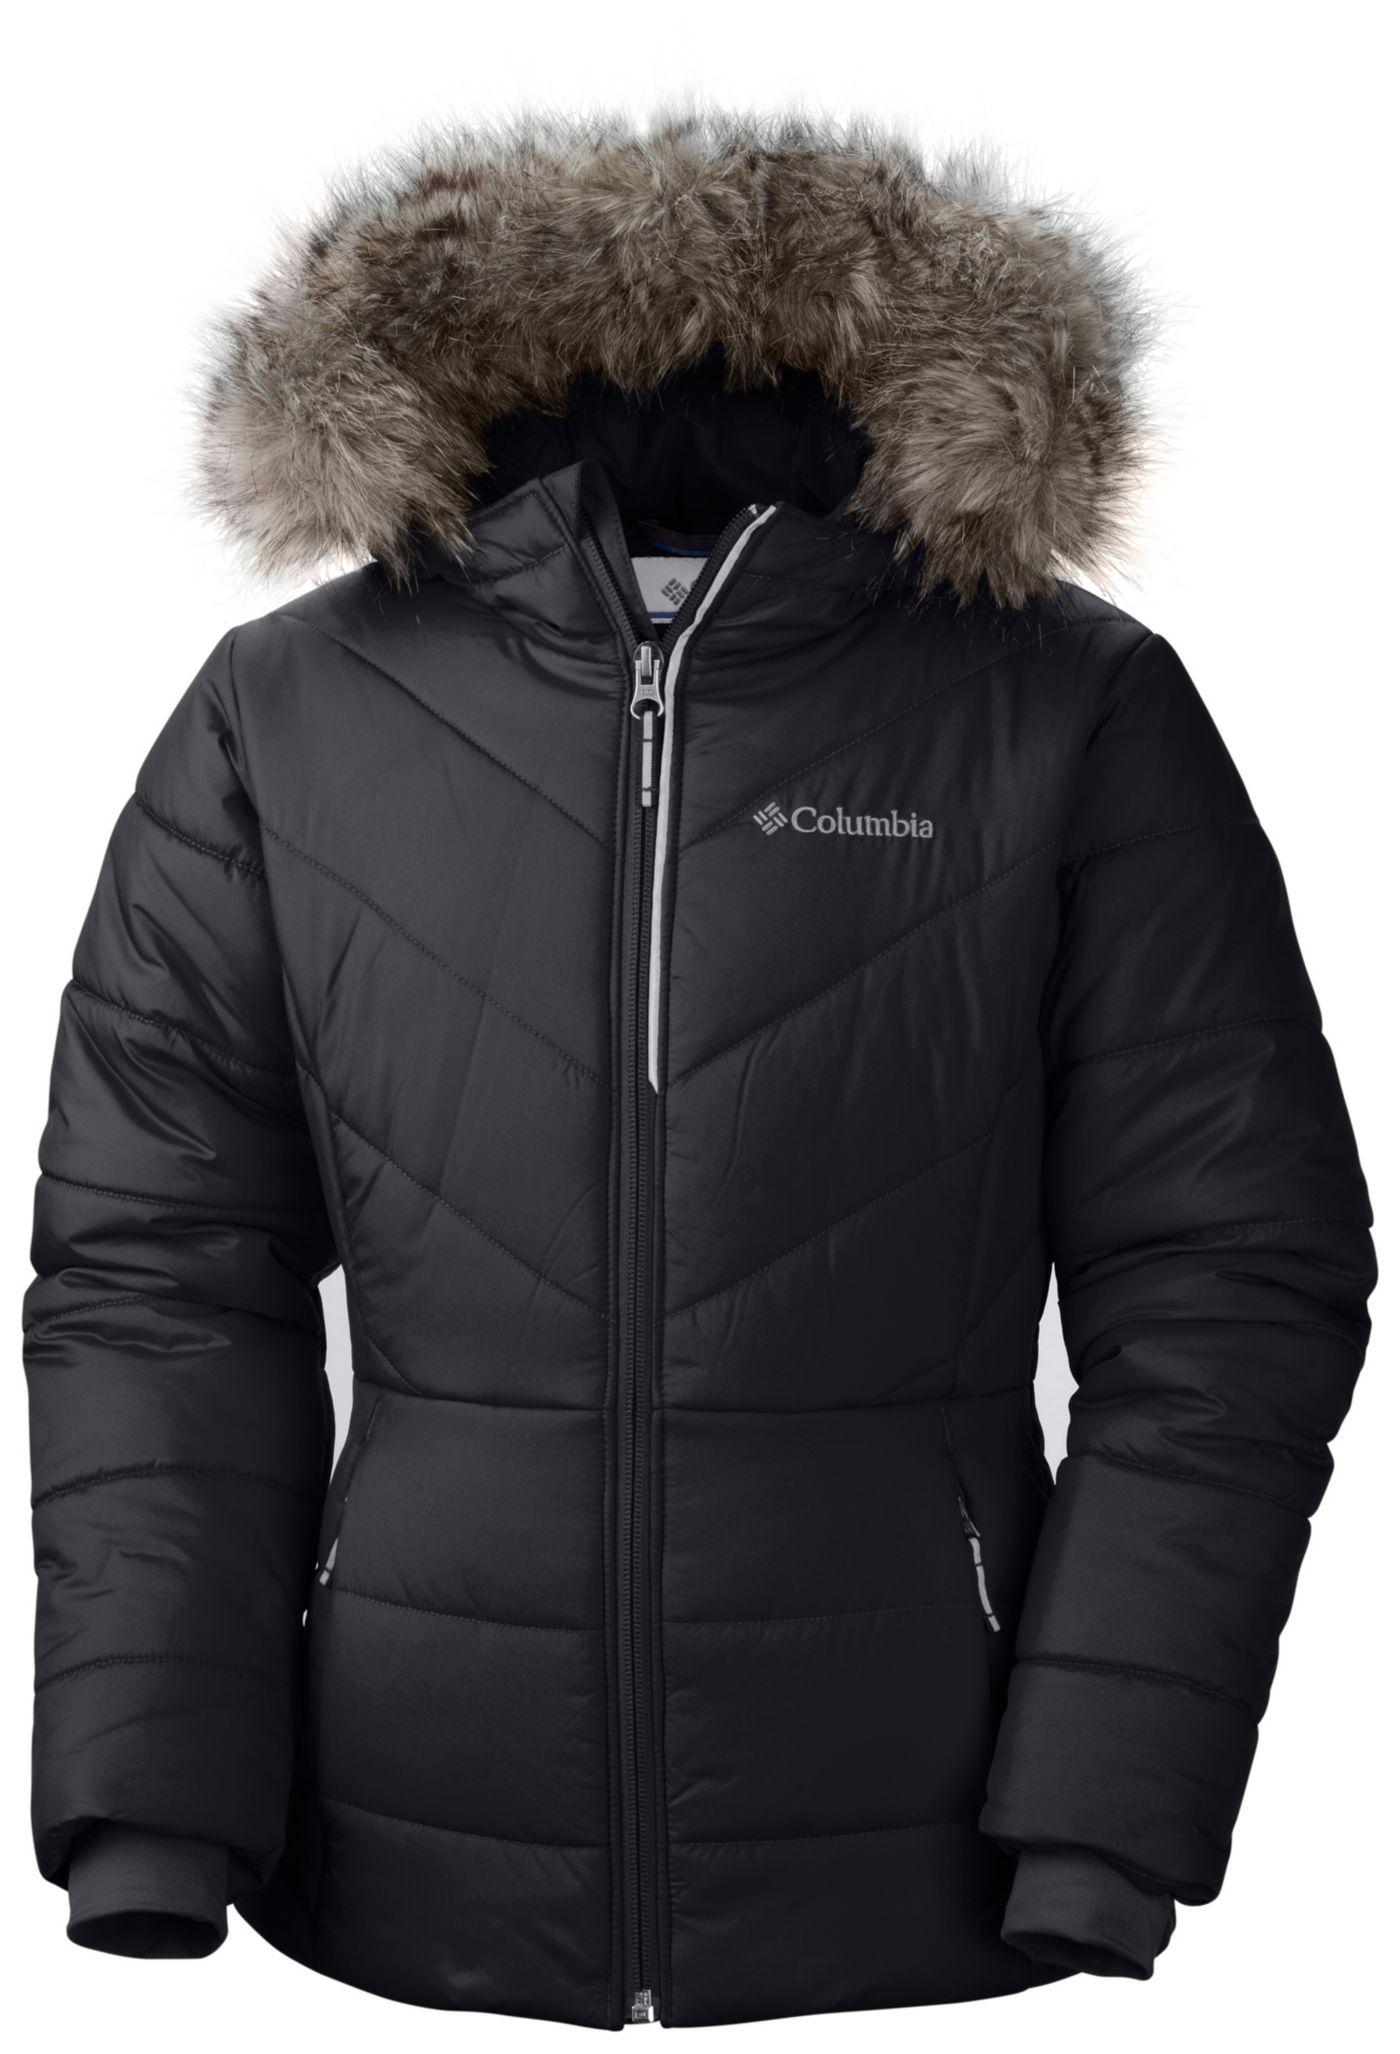 Columbia Girls' Katelyn Crest Insulated Jacket